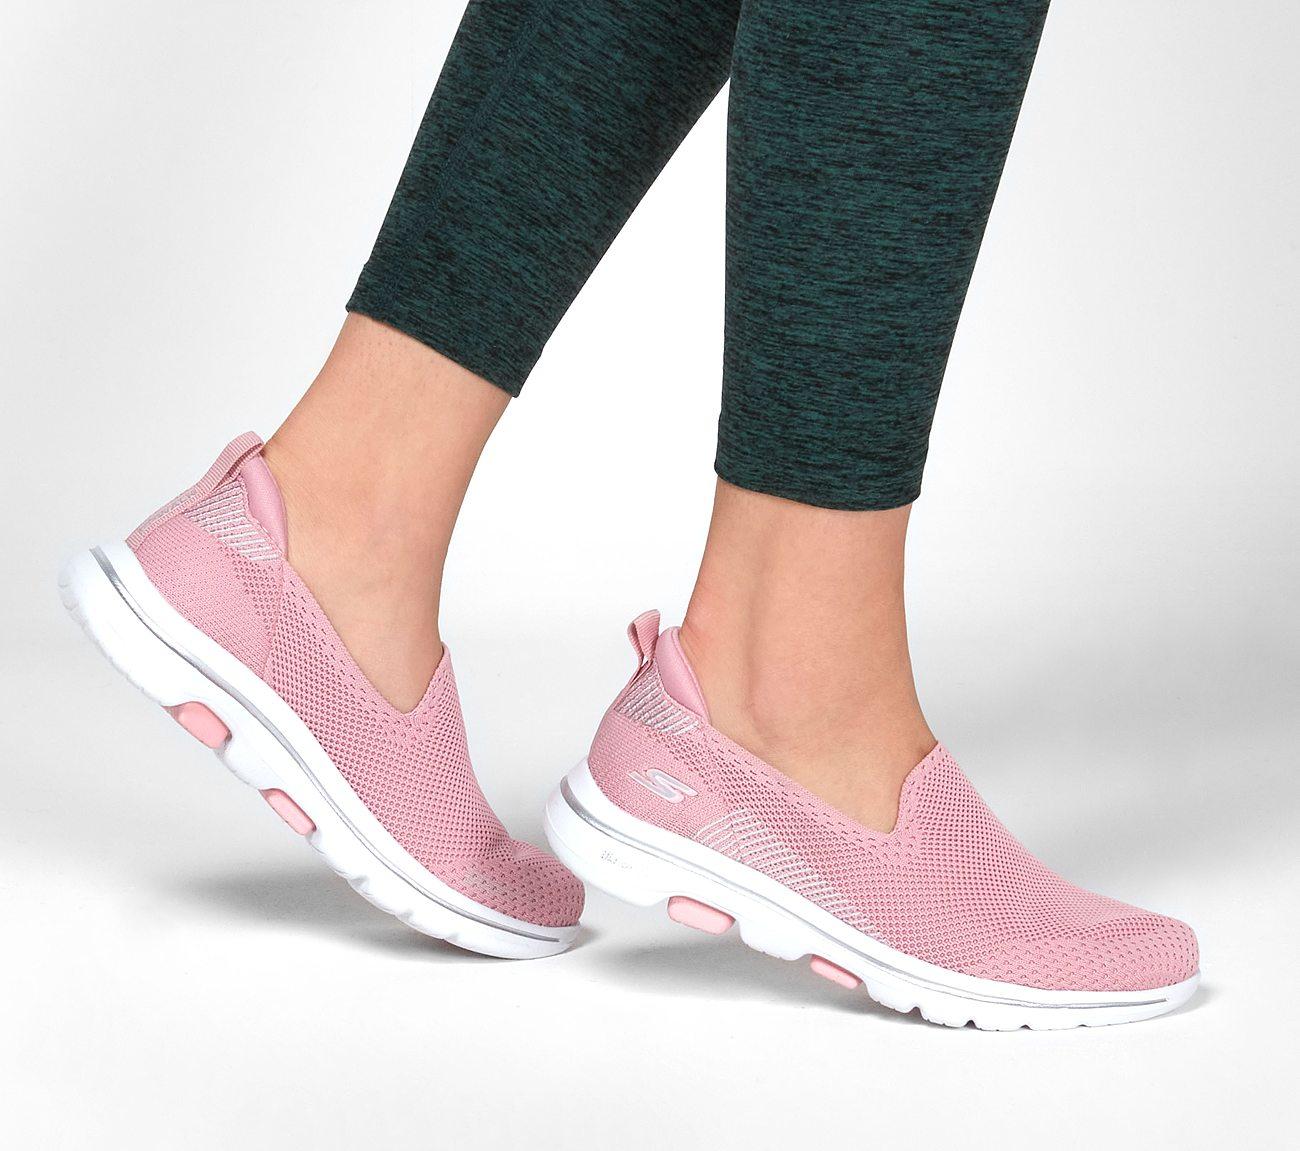 best price on skechers go walk